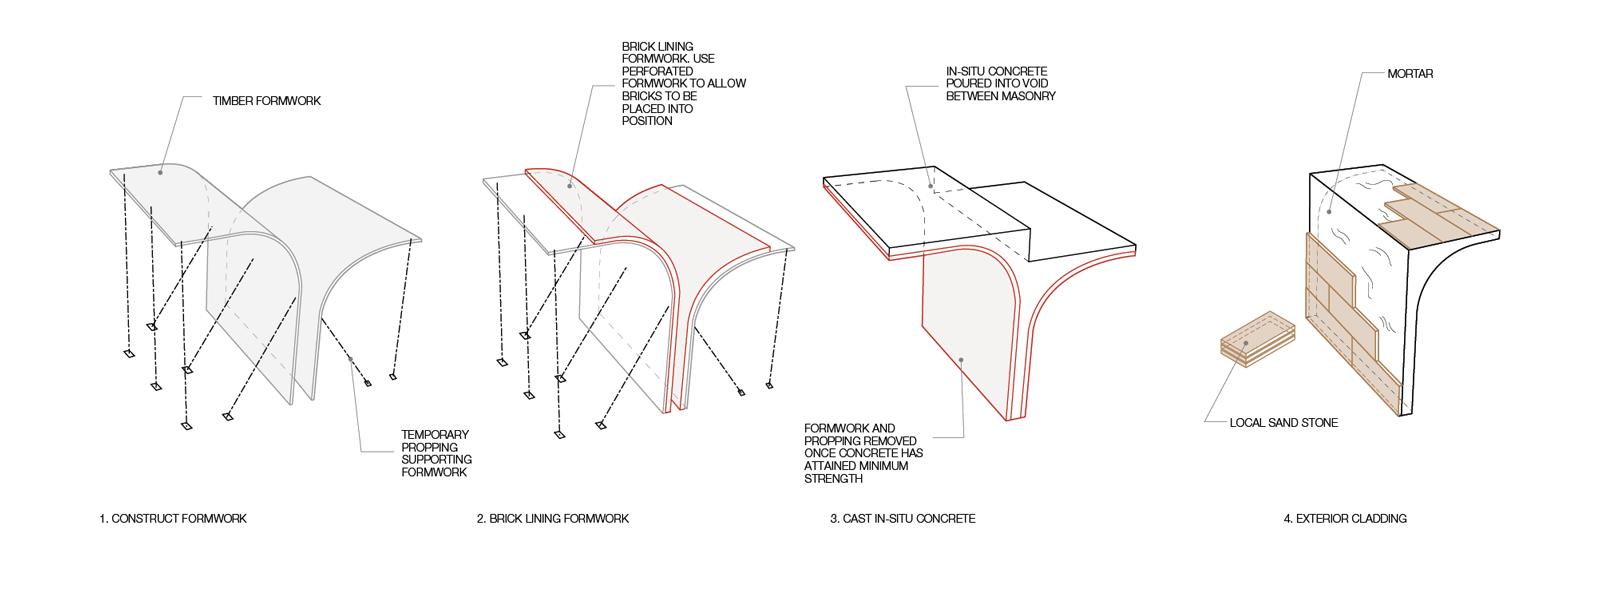 construction sequence diagram